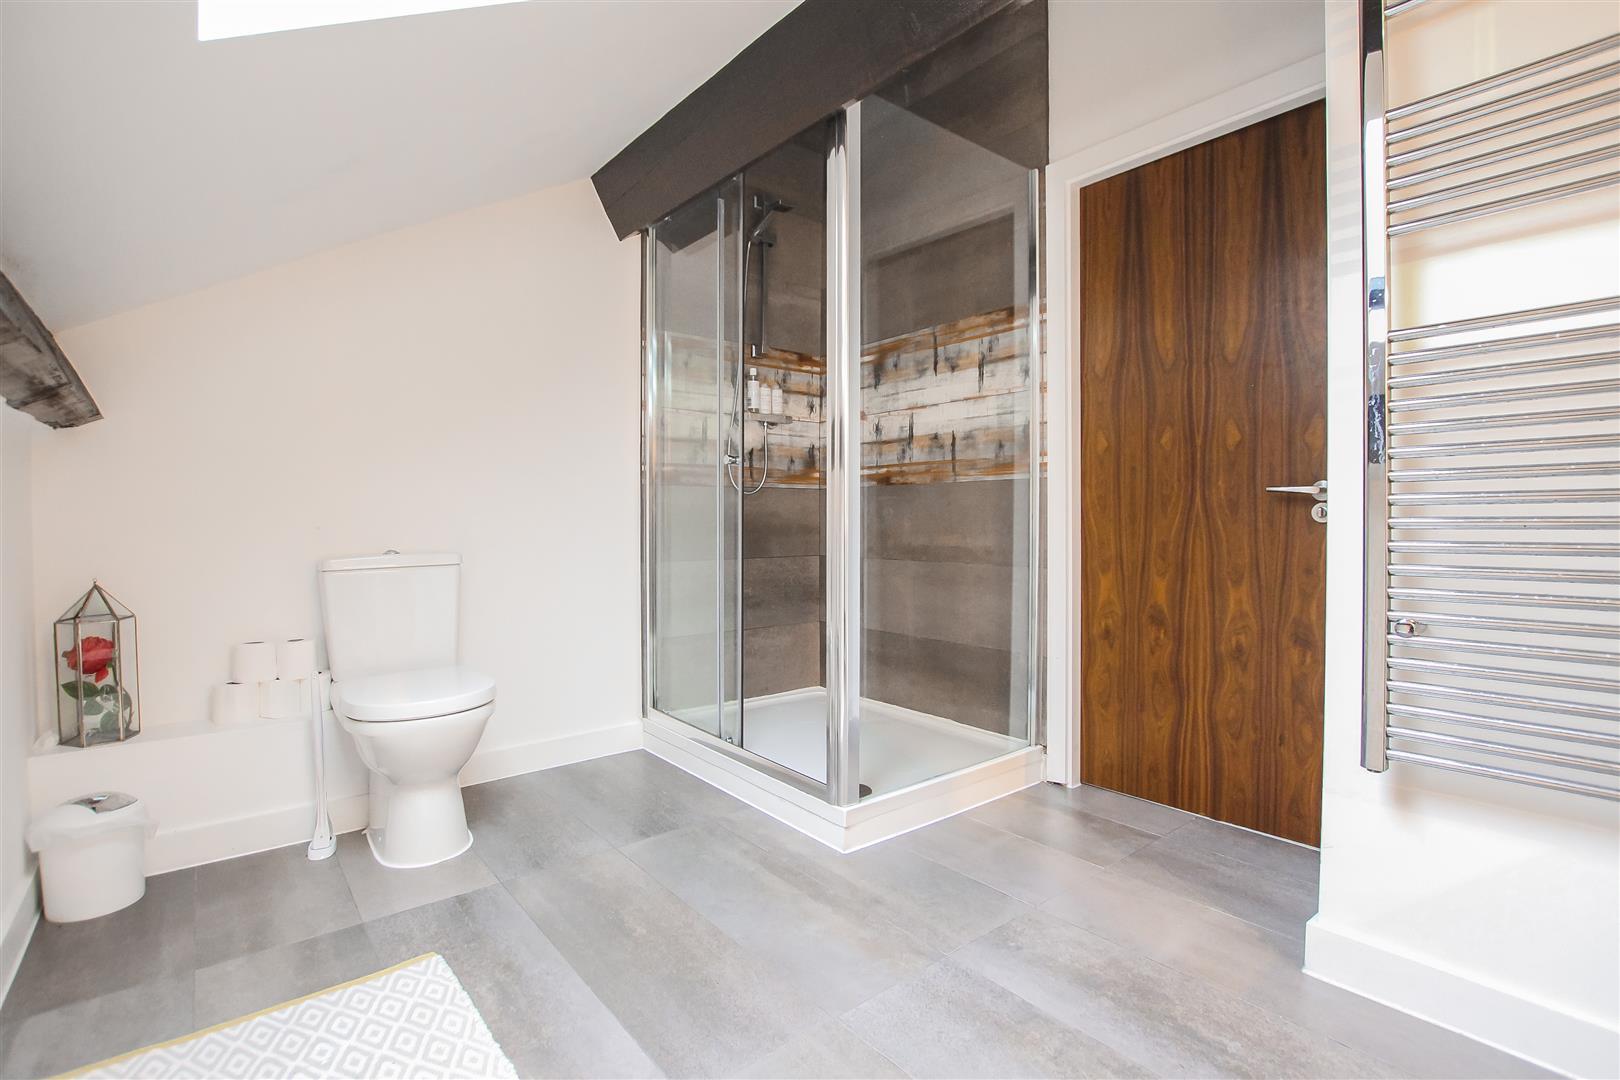 3 Bedroom Duplex Apartment For Sale - Image 58